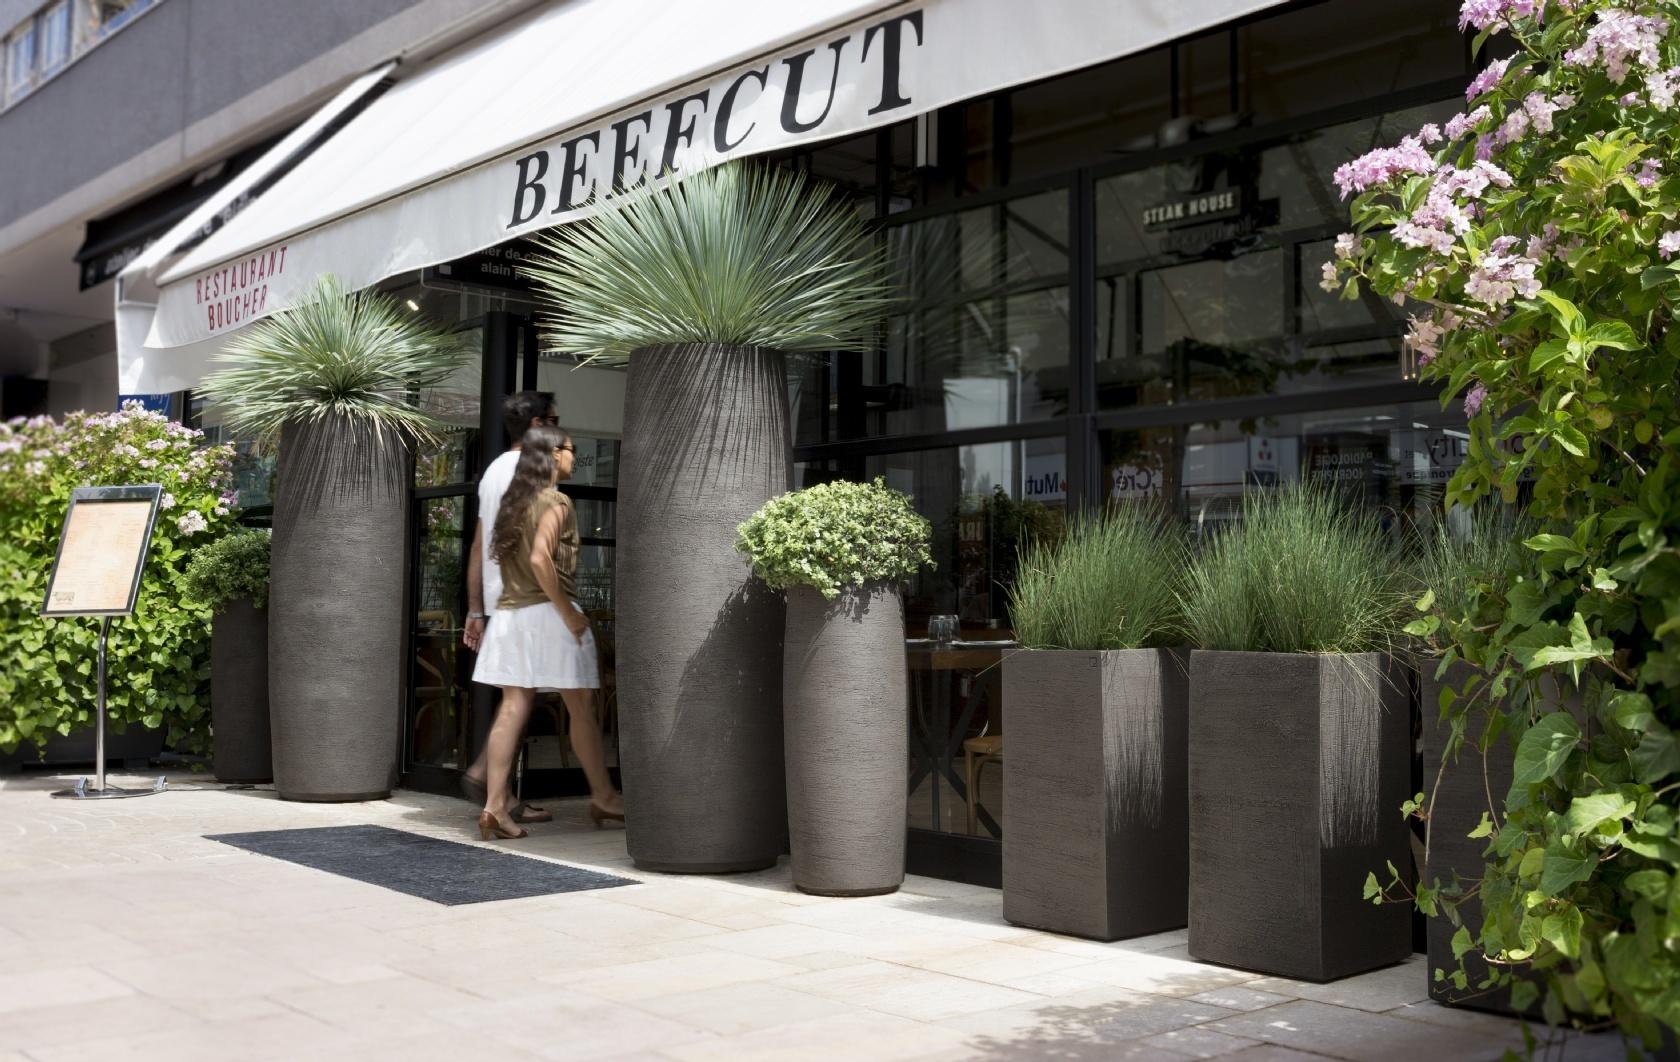 Beefcut